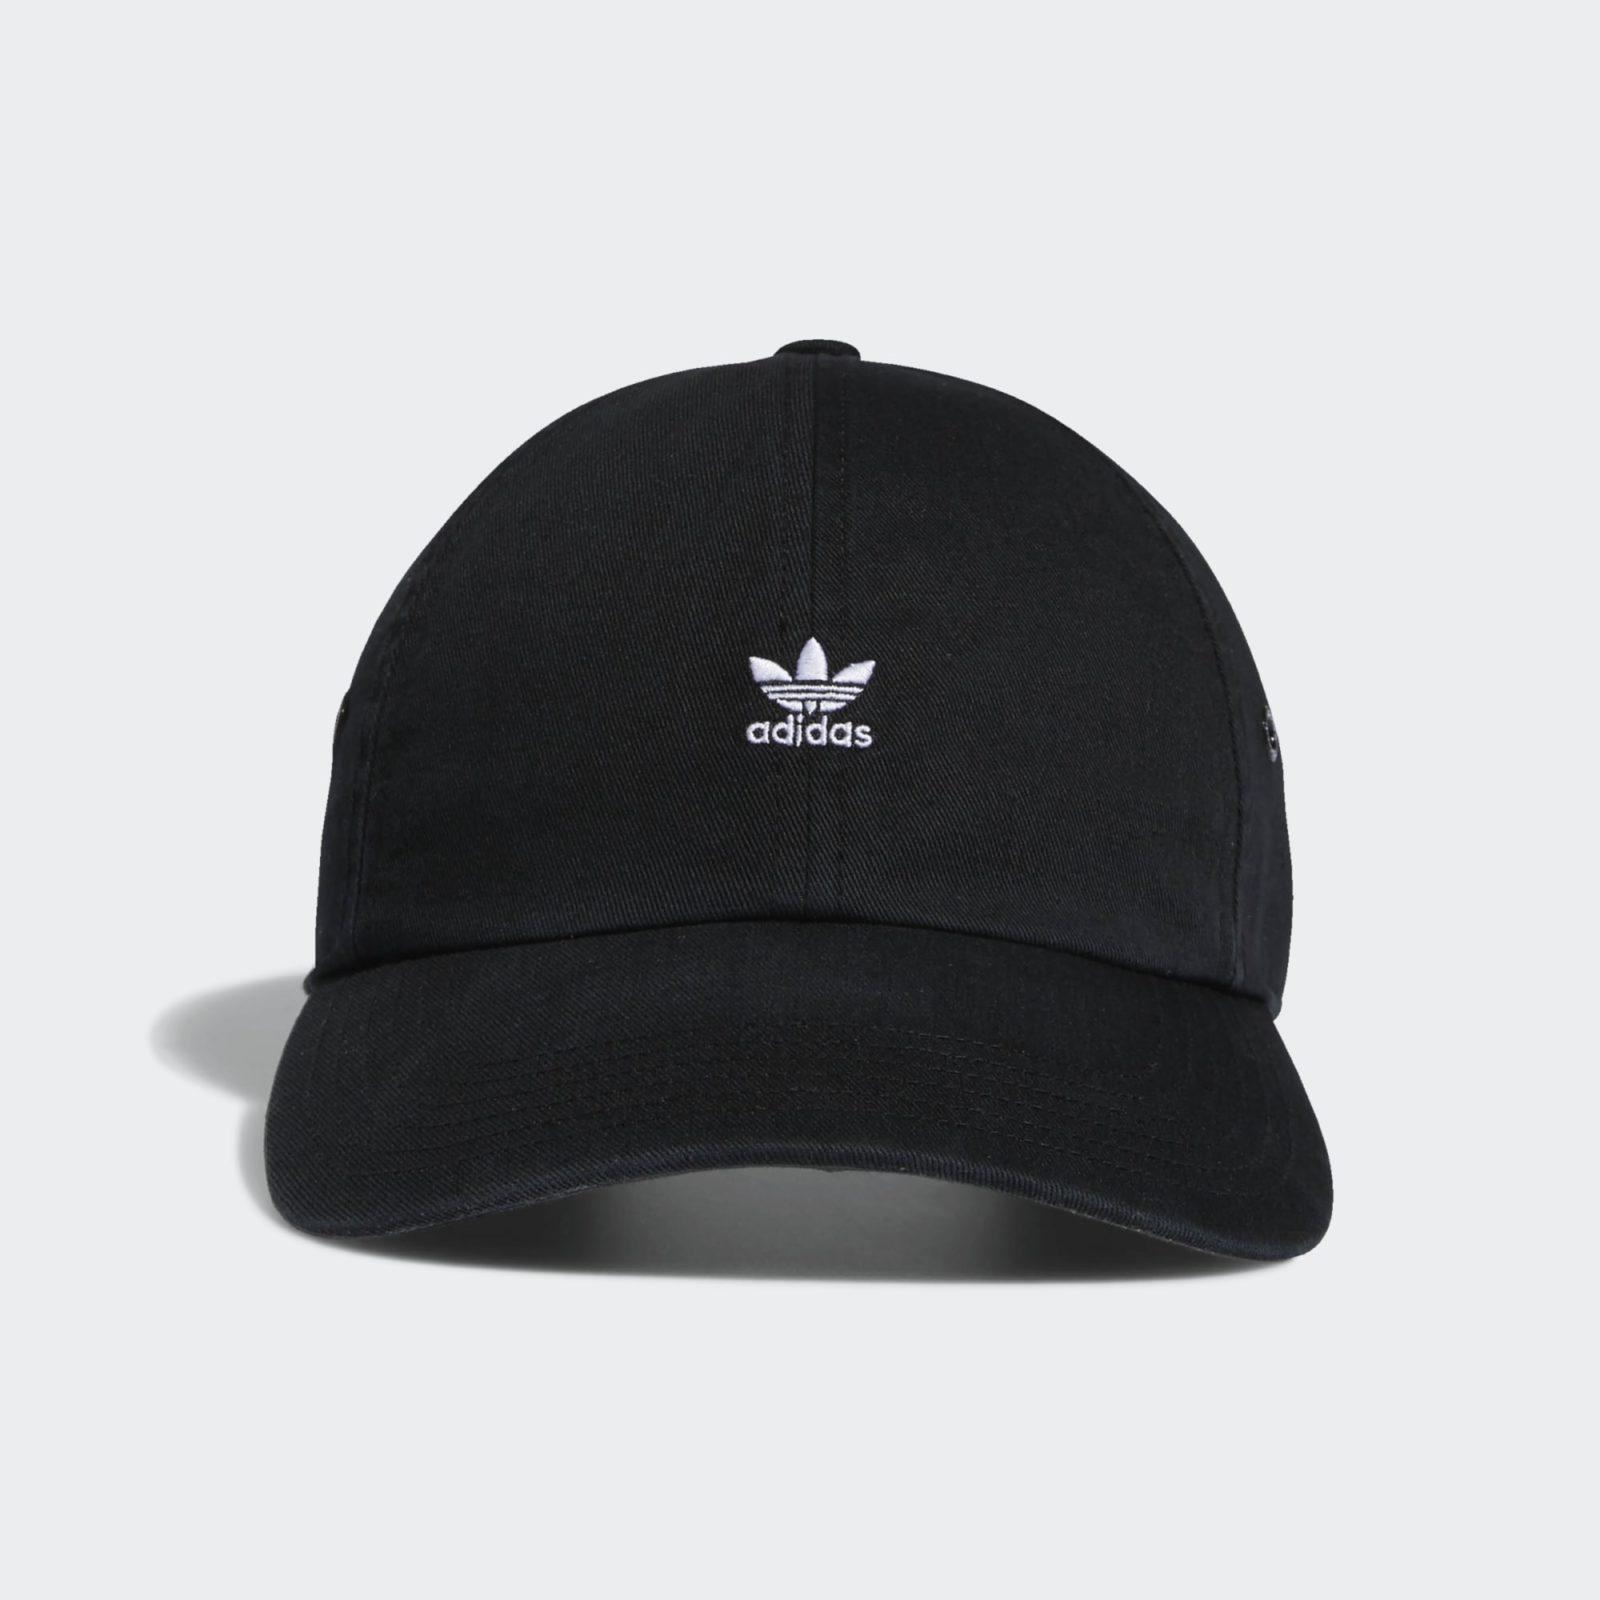 Adidas sale hat